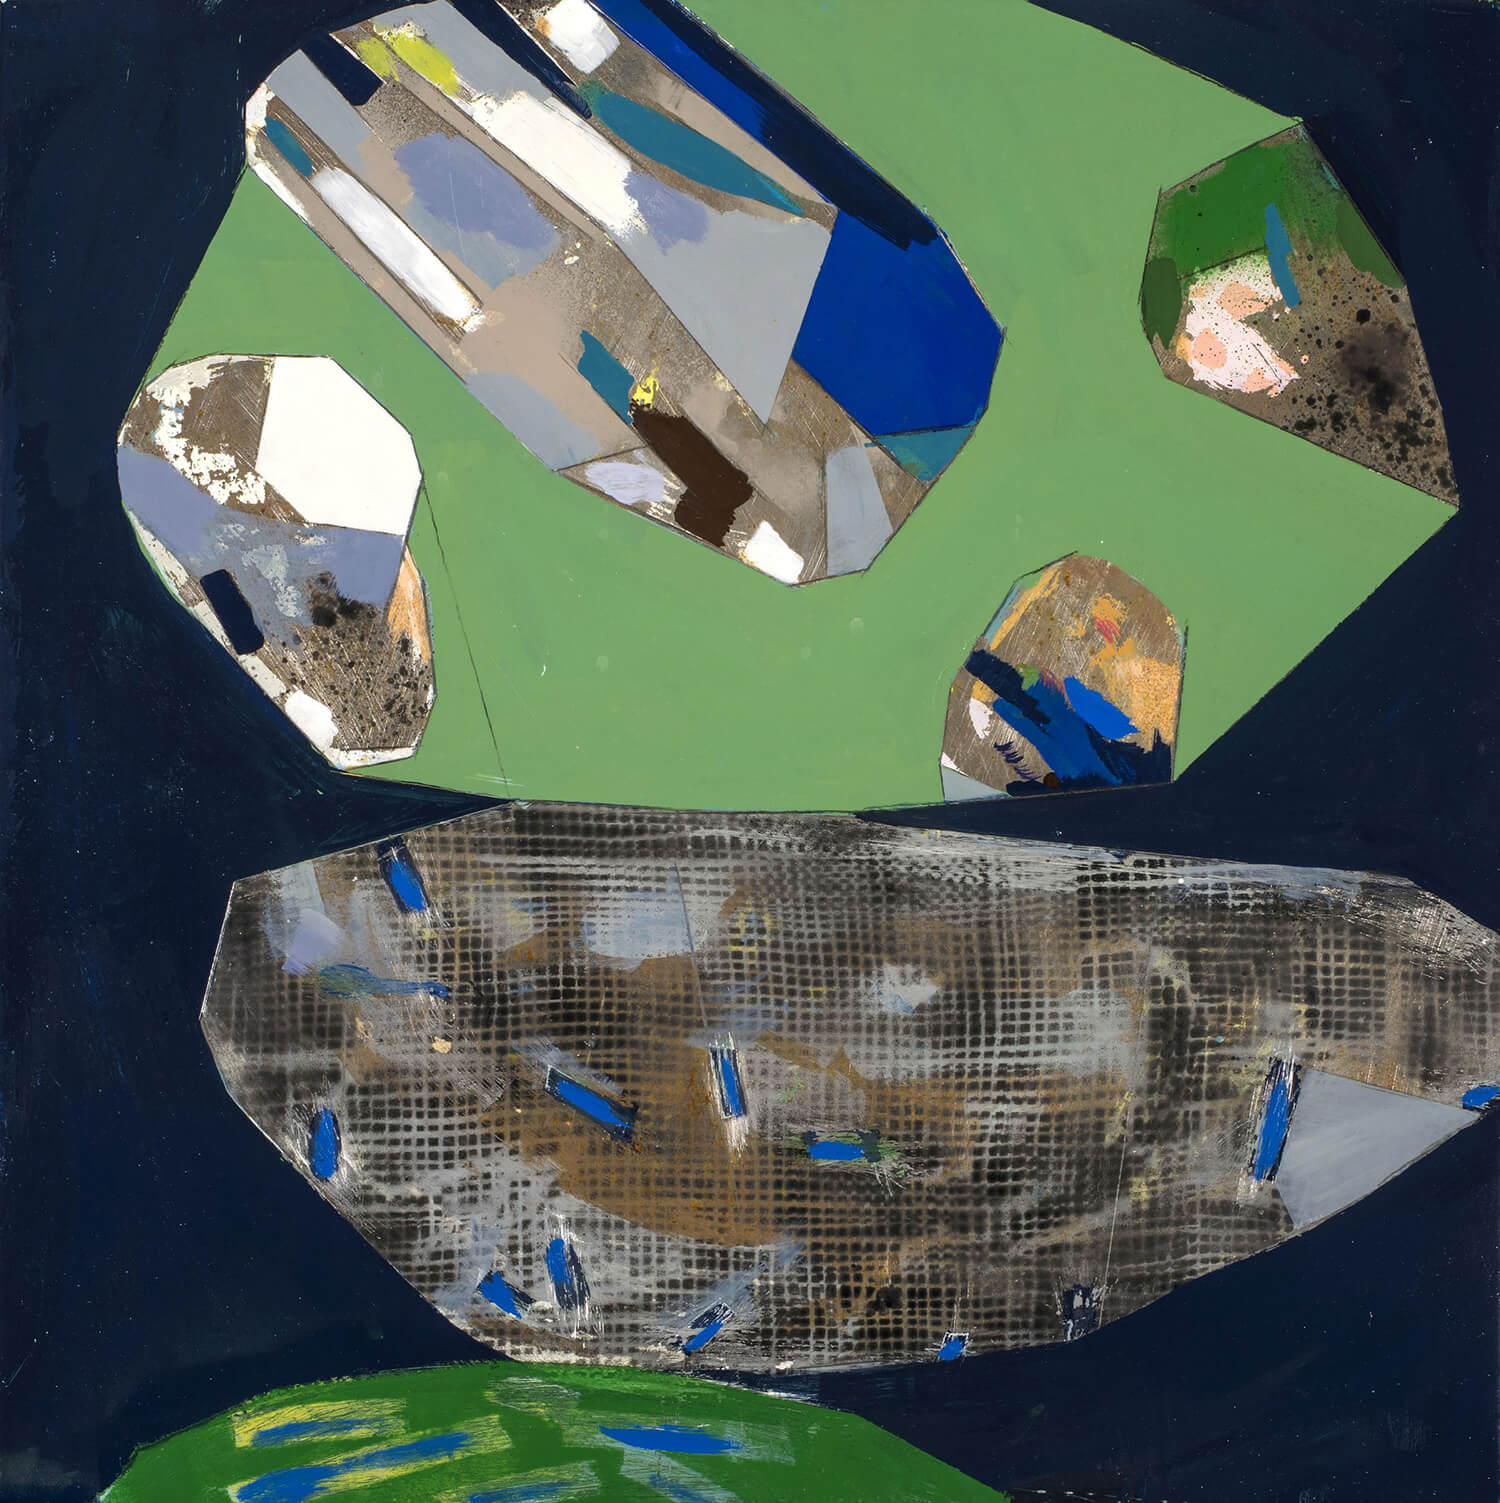 'Xenoliths' by Ari Athens | Edwina Corlette Gallery | Est Design Directory